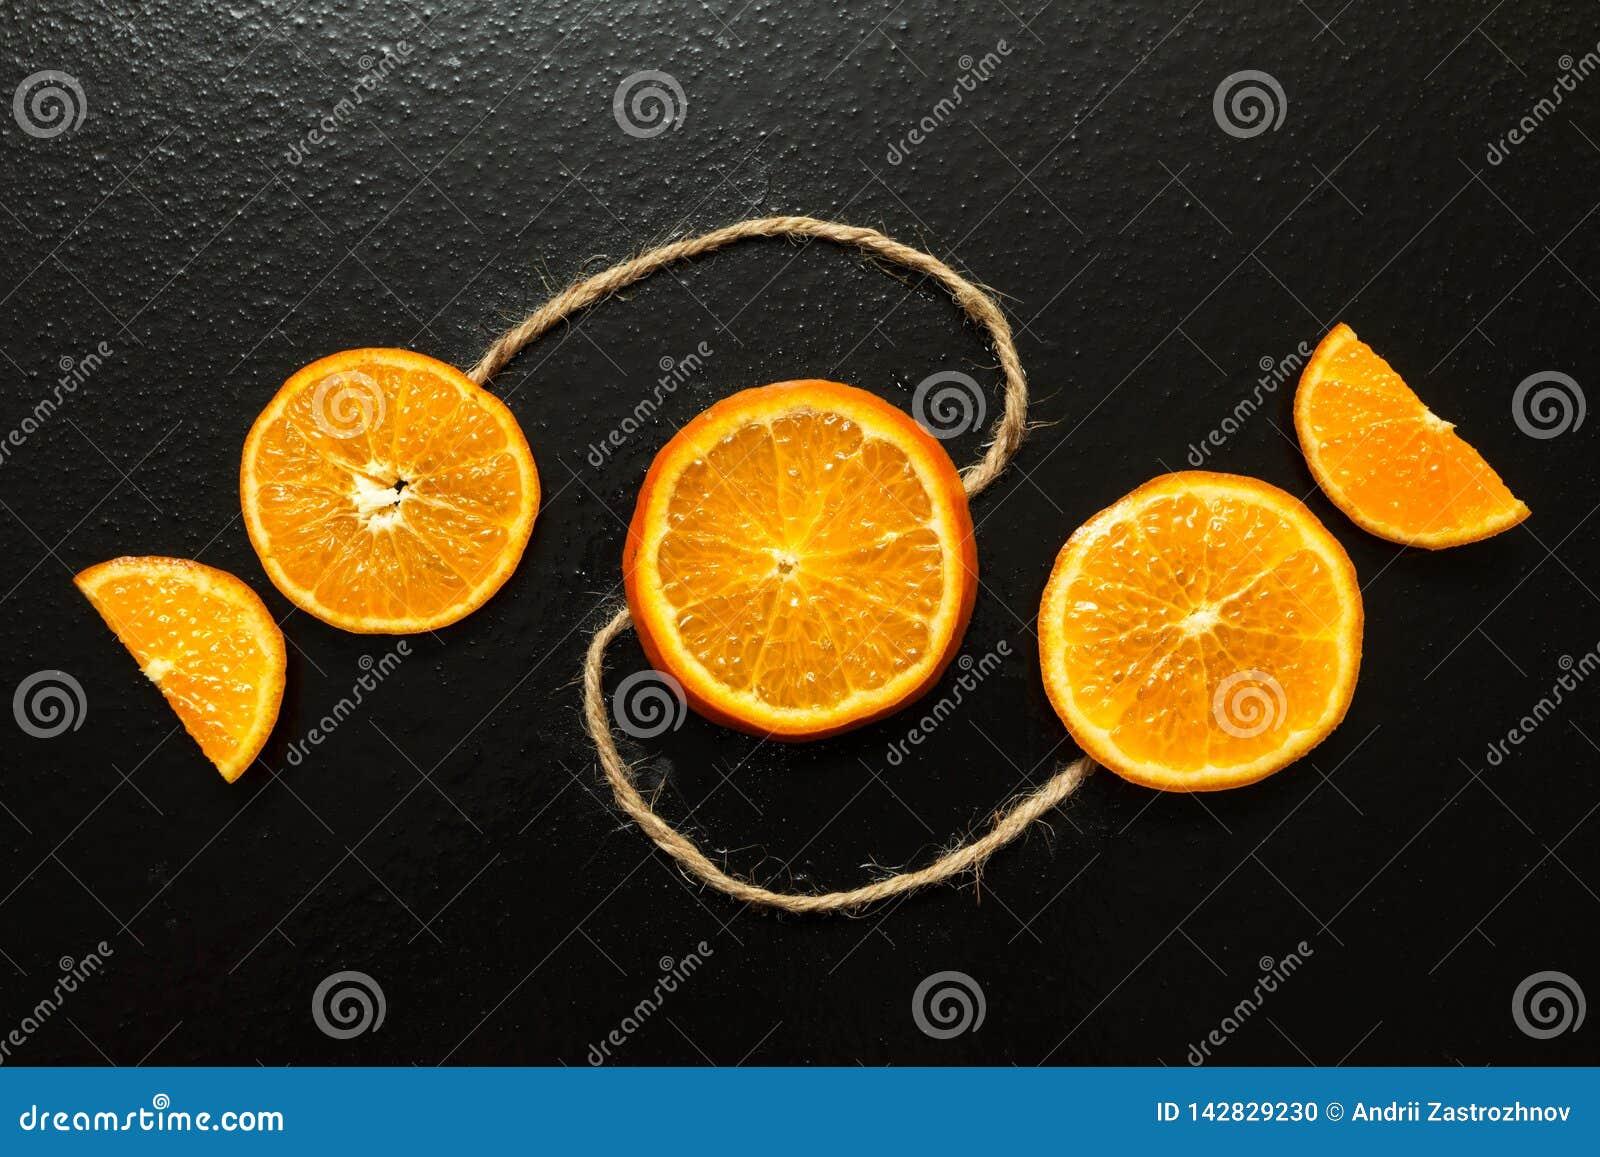 Slices of oranges on a black background